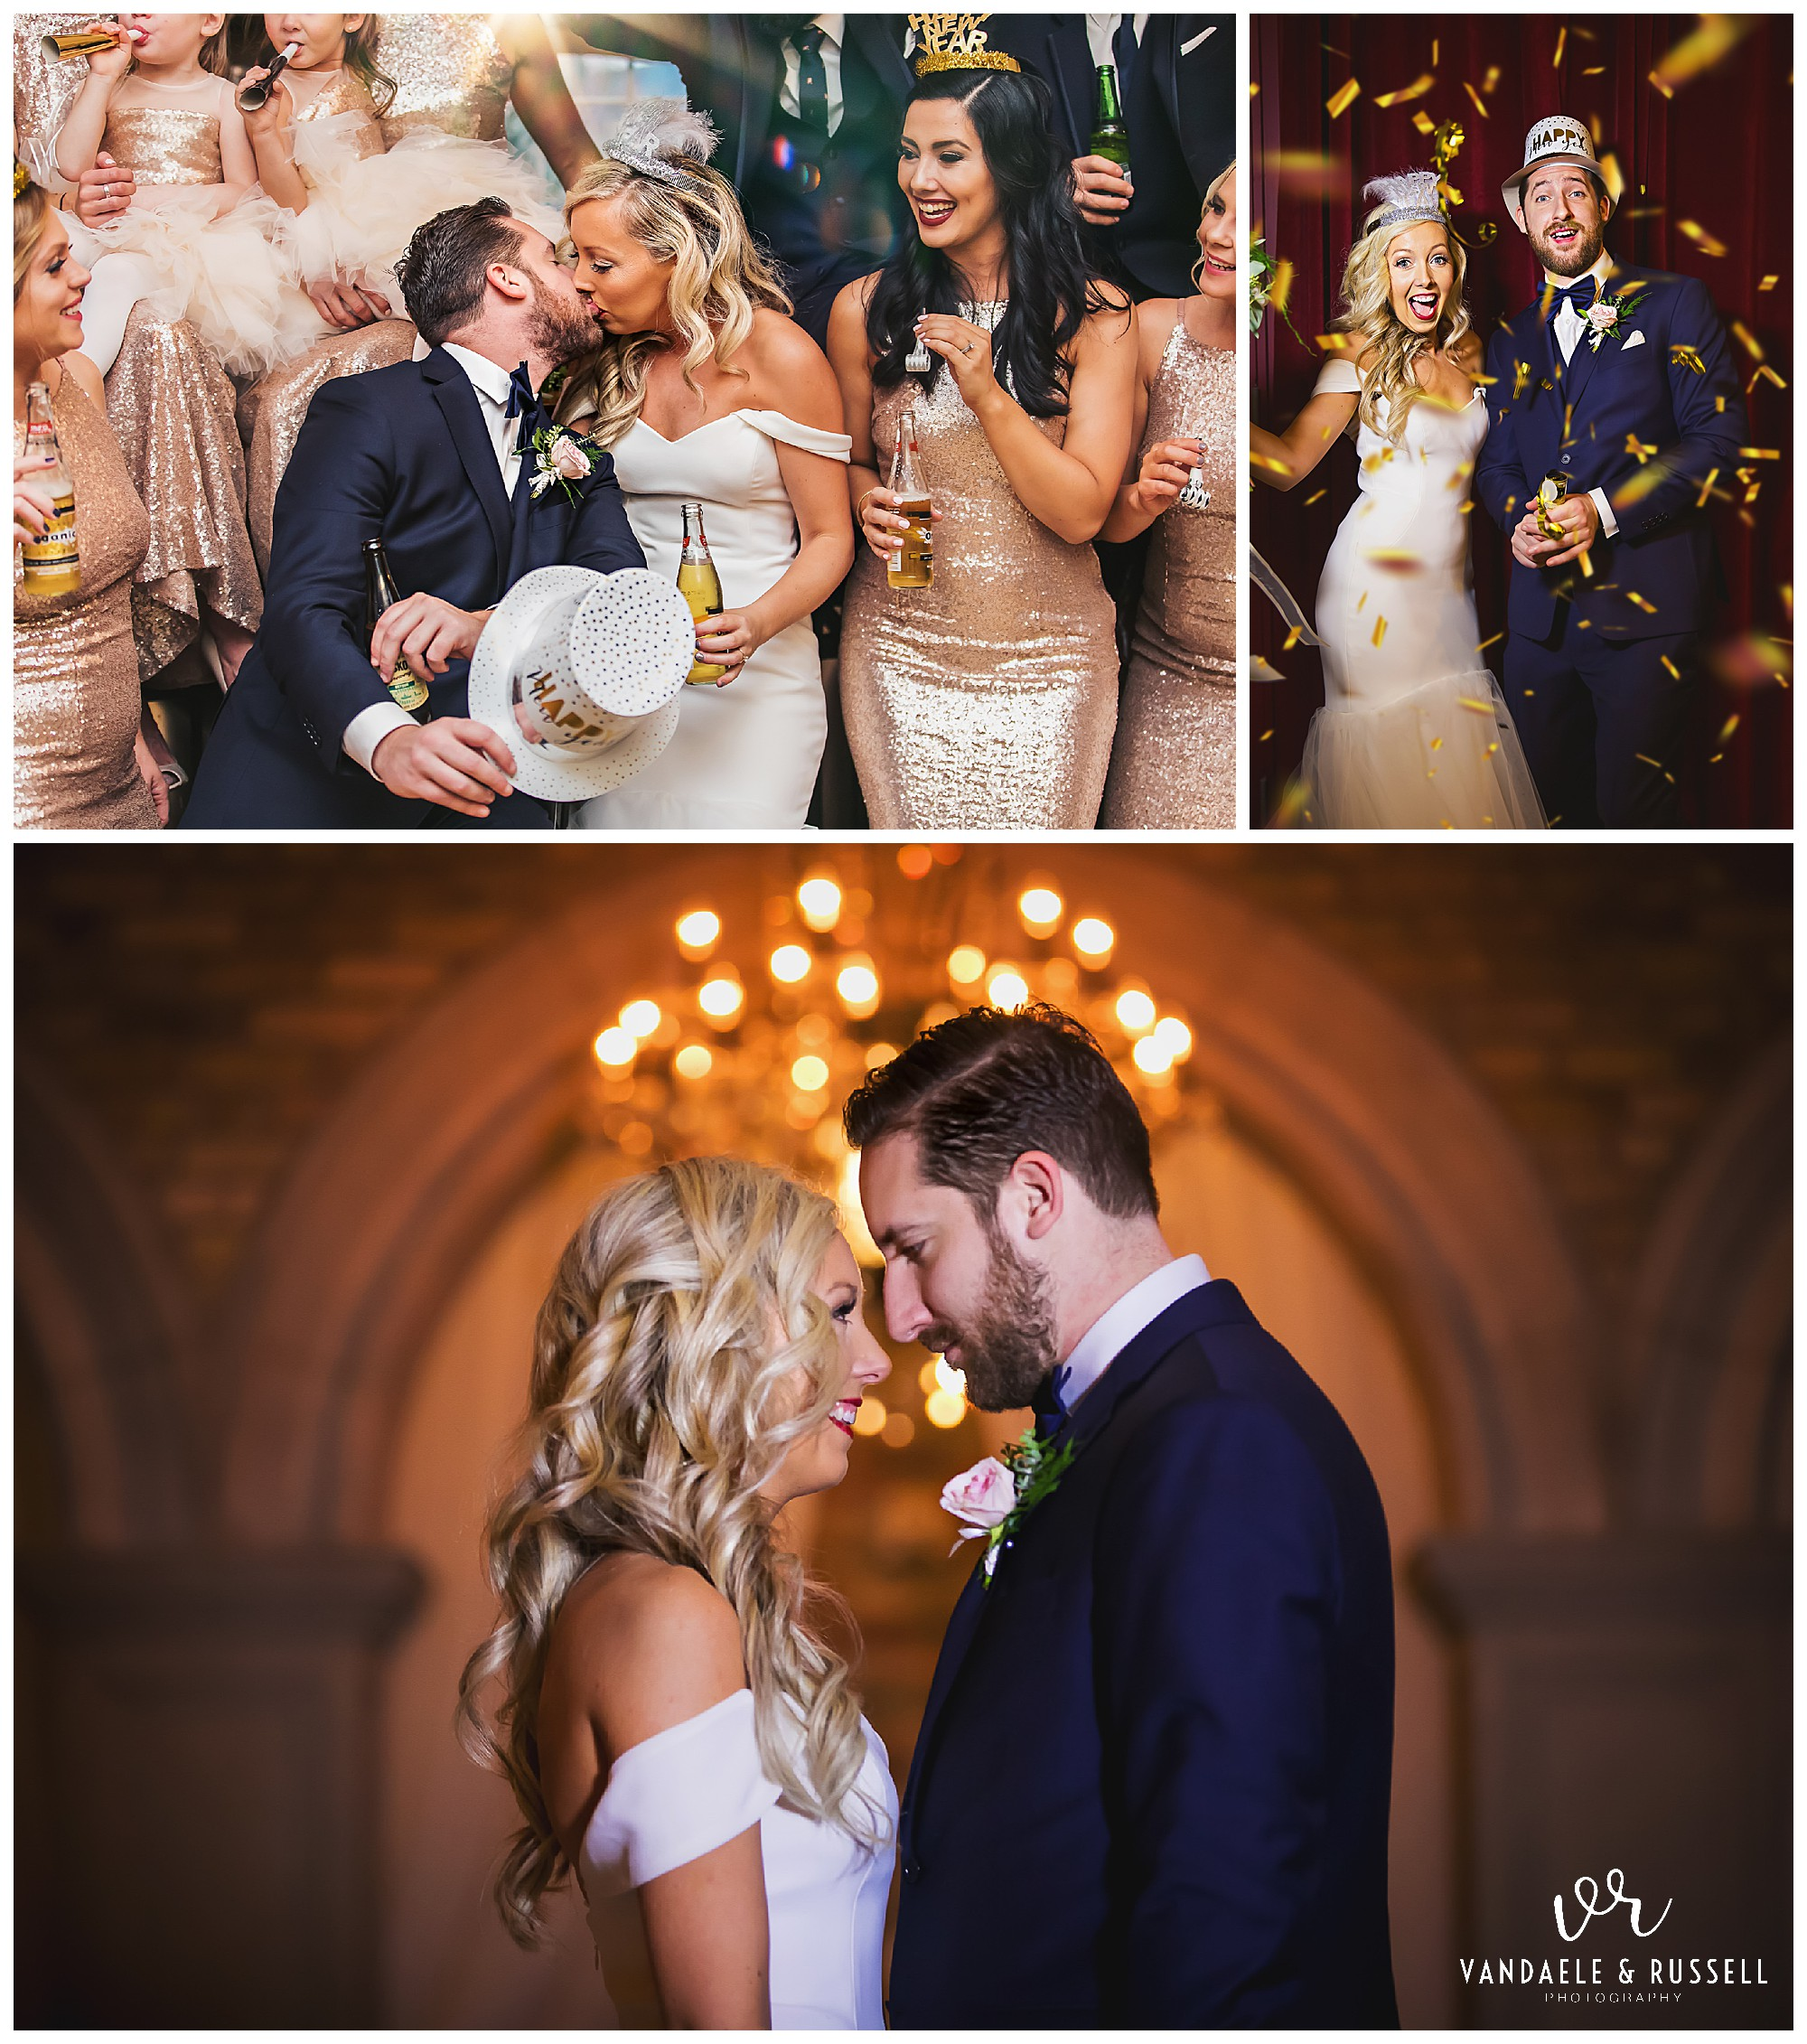 Hacienda-Sarria-Wedding-Photos-NYE-Michelle-Matt-VanDaele-Russell_0013.jpg